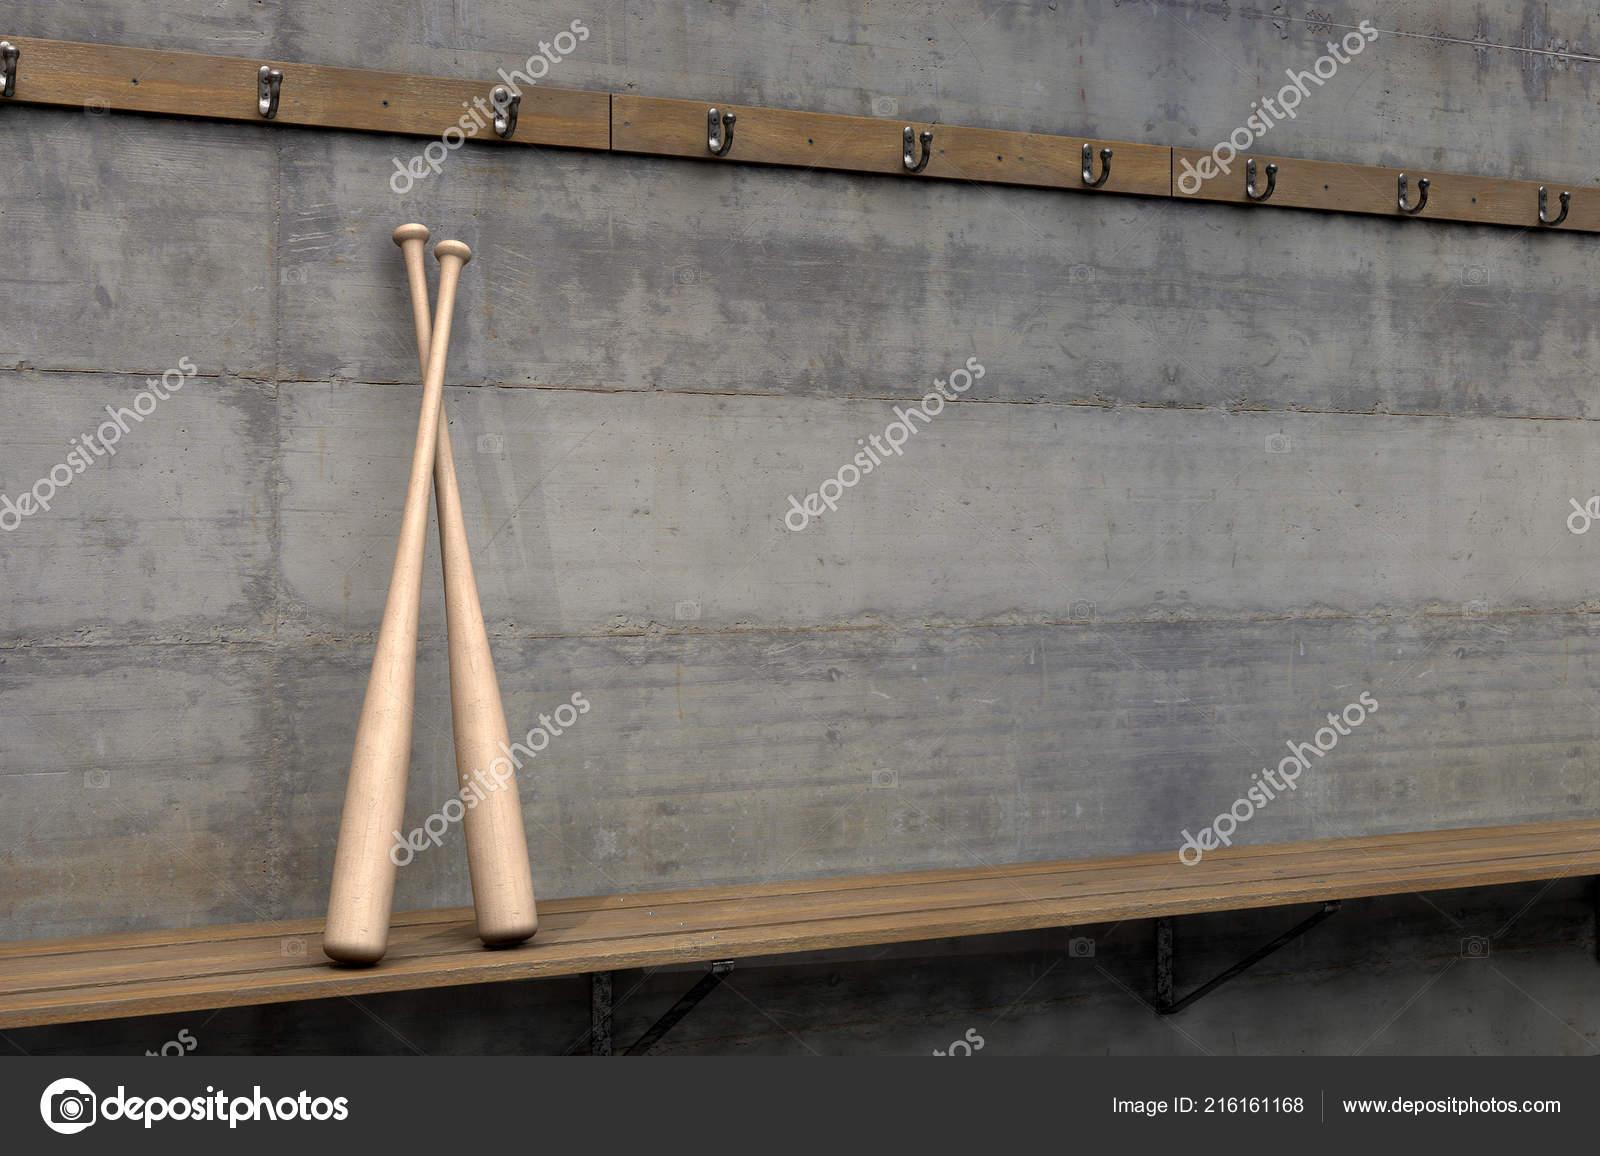 Pleasing Two Baseball Bats Wooden Bench Rundown Sports Locker Change Machost Co Dining Chair Design Ideas Machostcouk